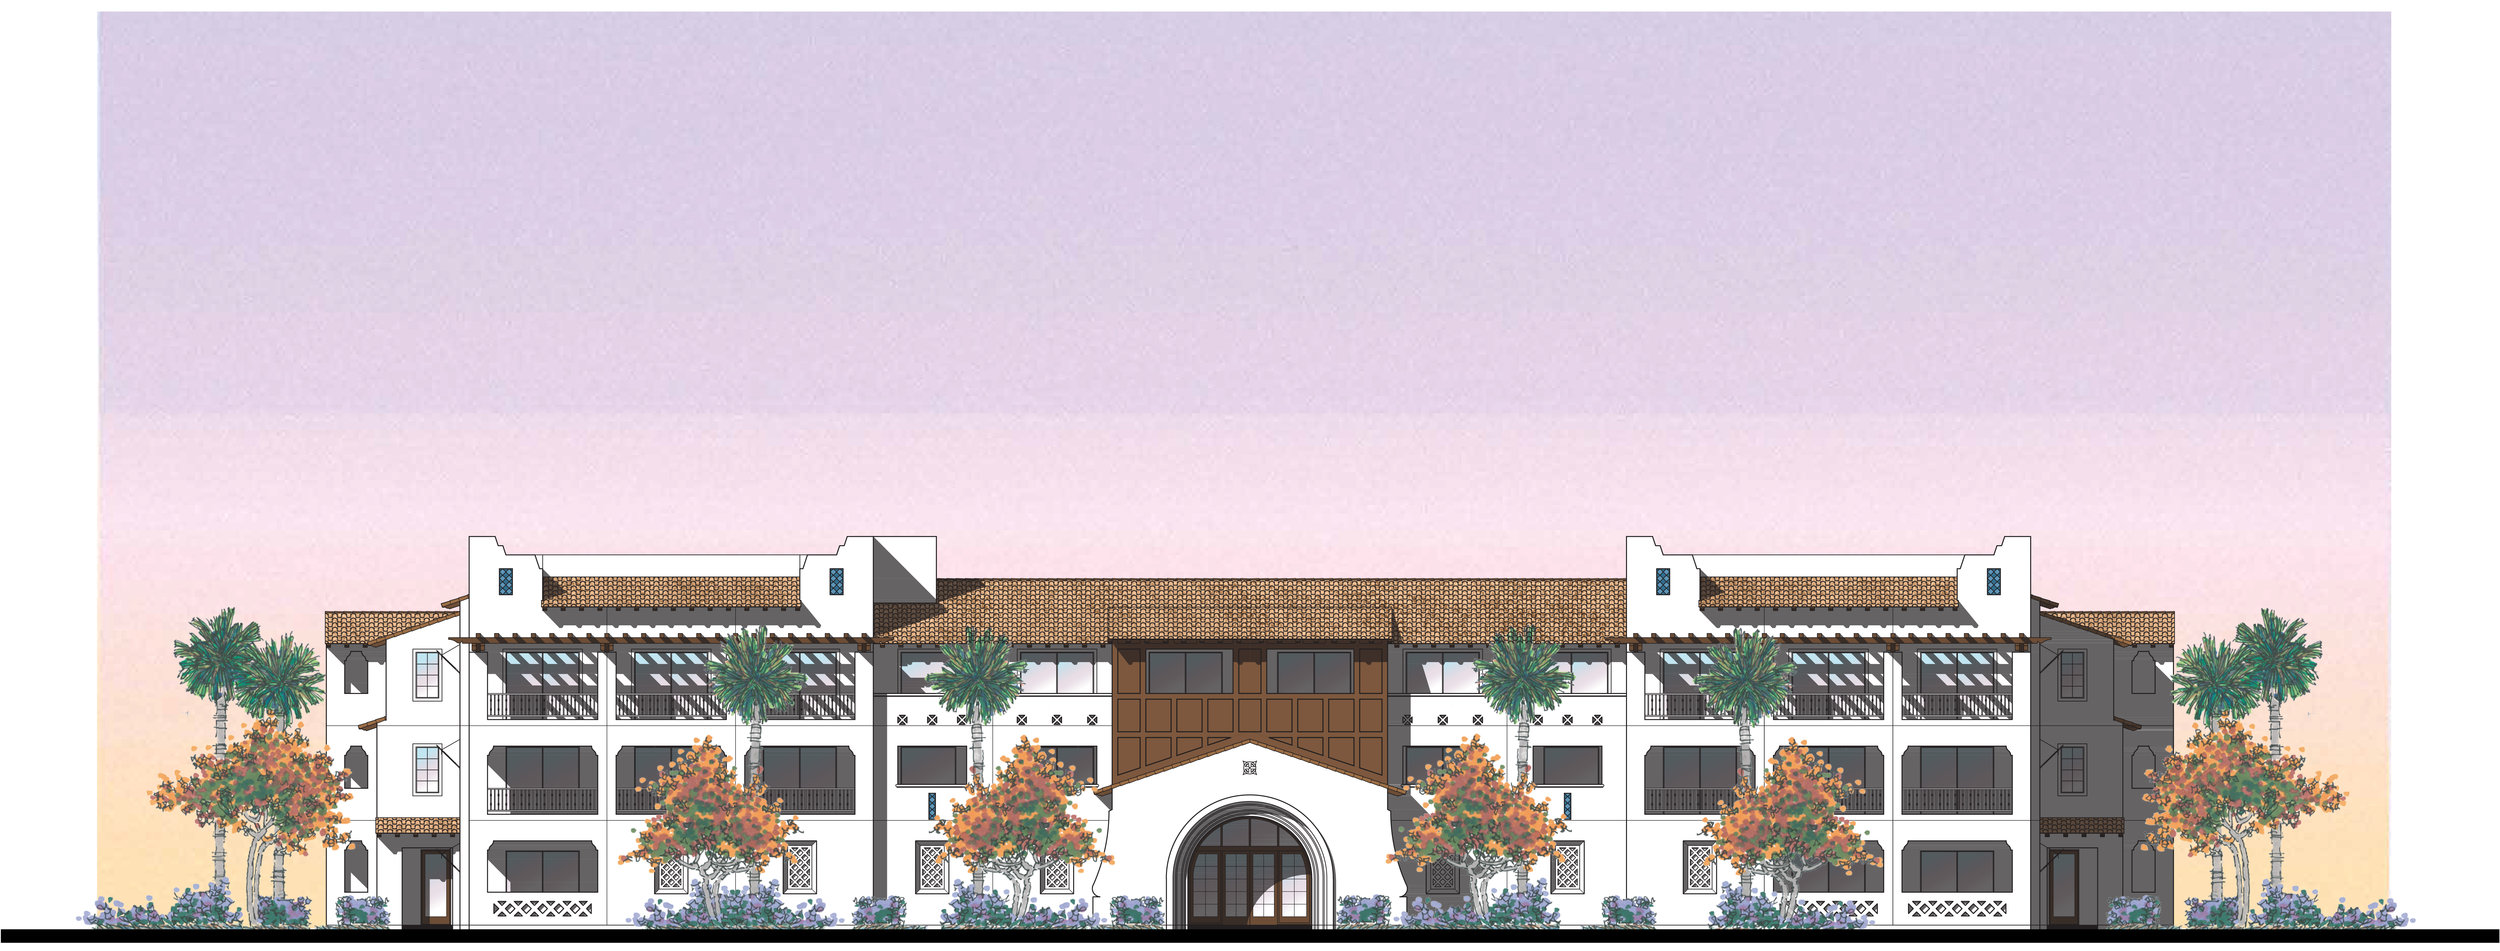 Boutique Hotel - Rear Elevation